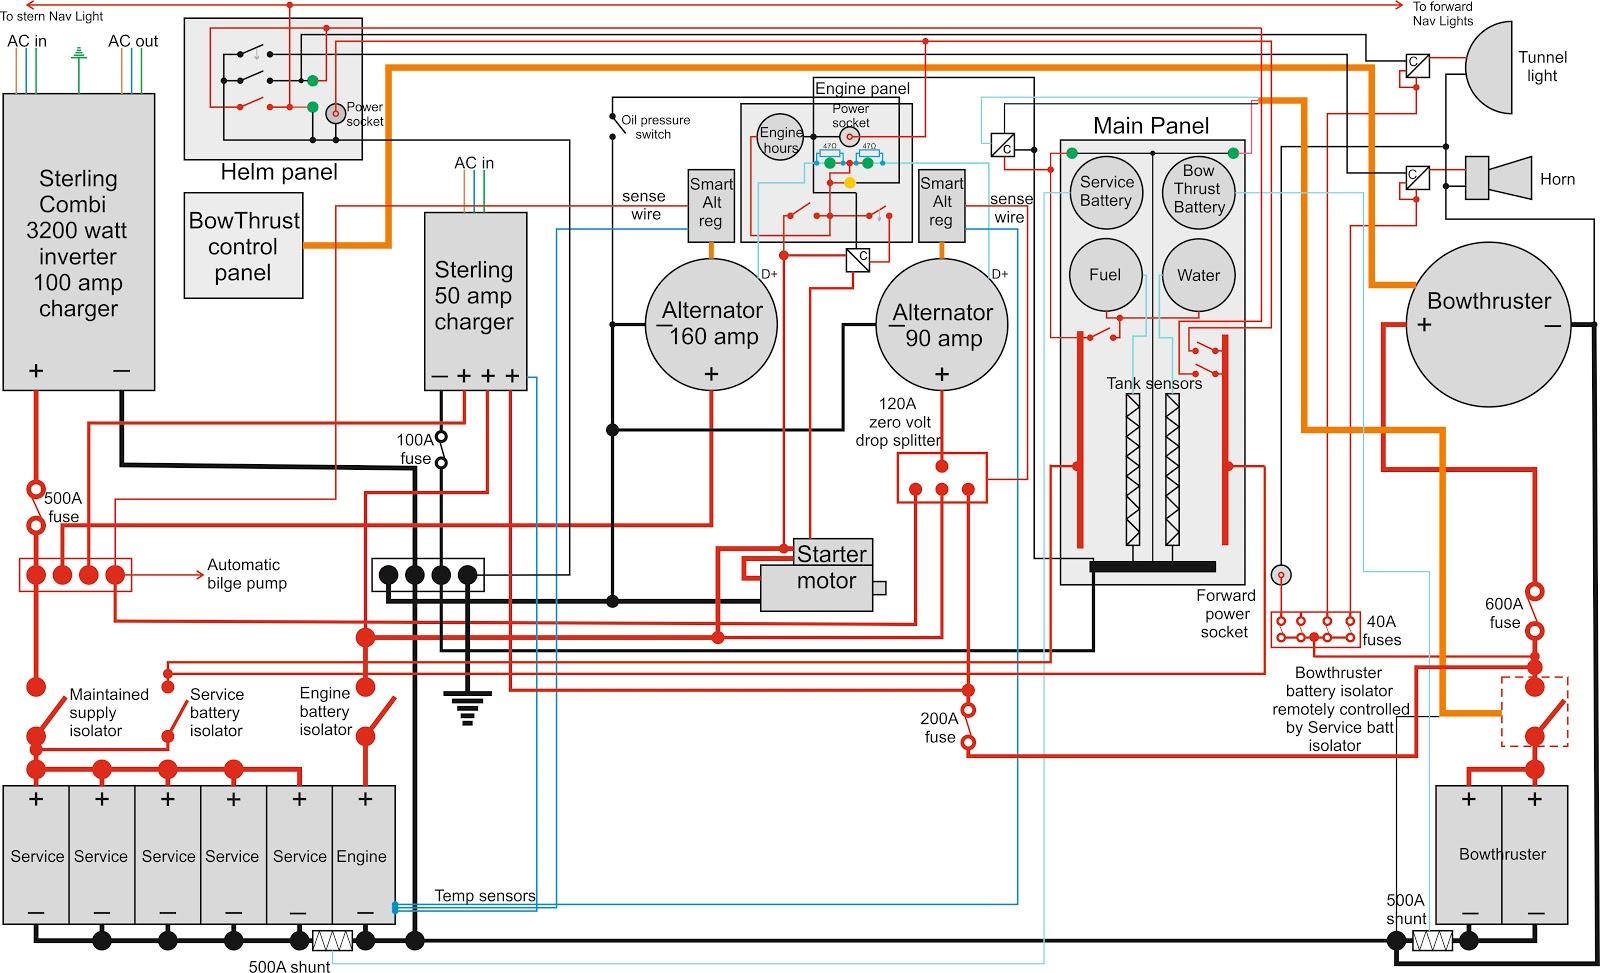 240 volt motor wiring diagram basket ball clip art field positions, Wiring diagram